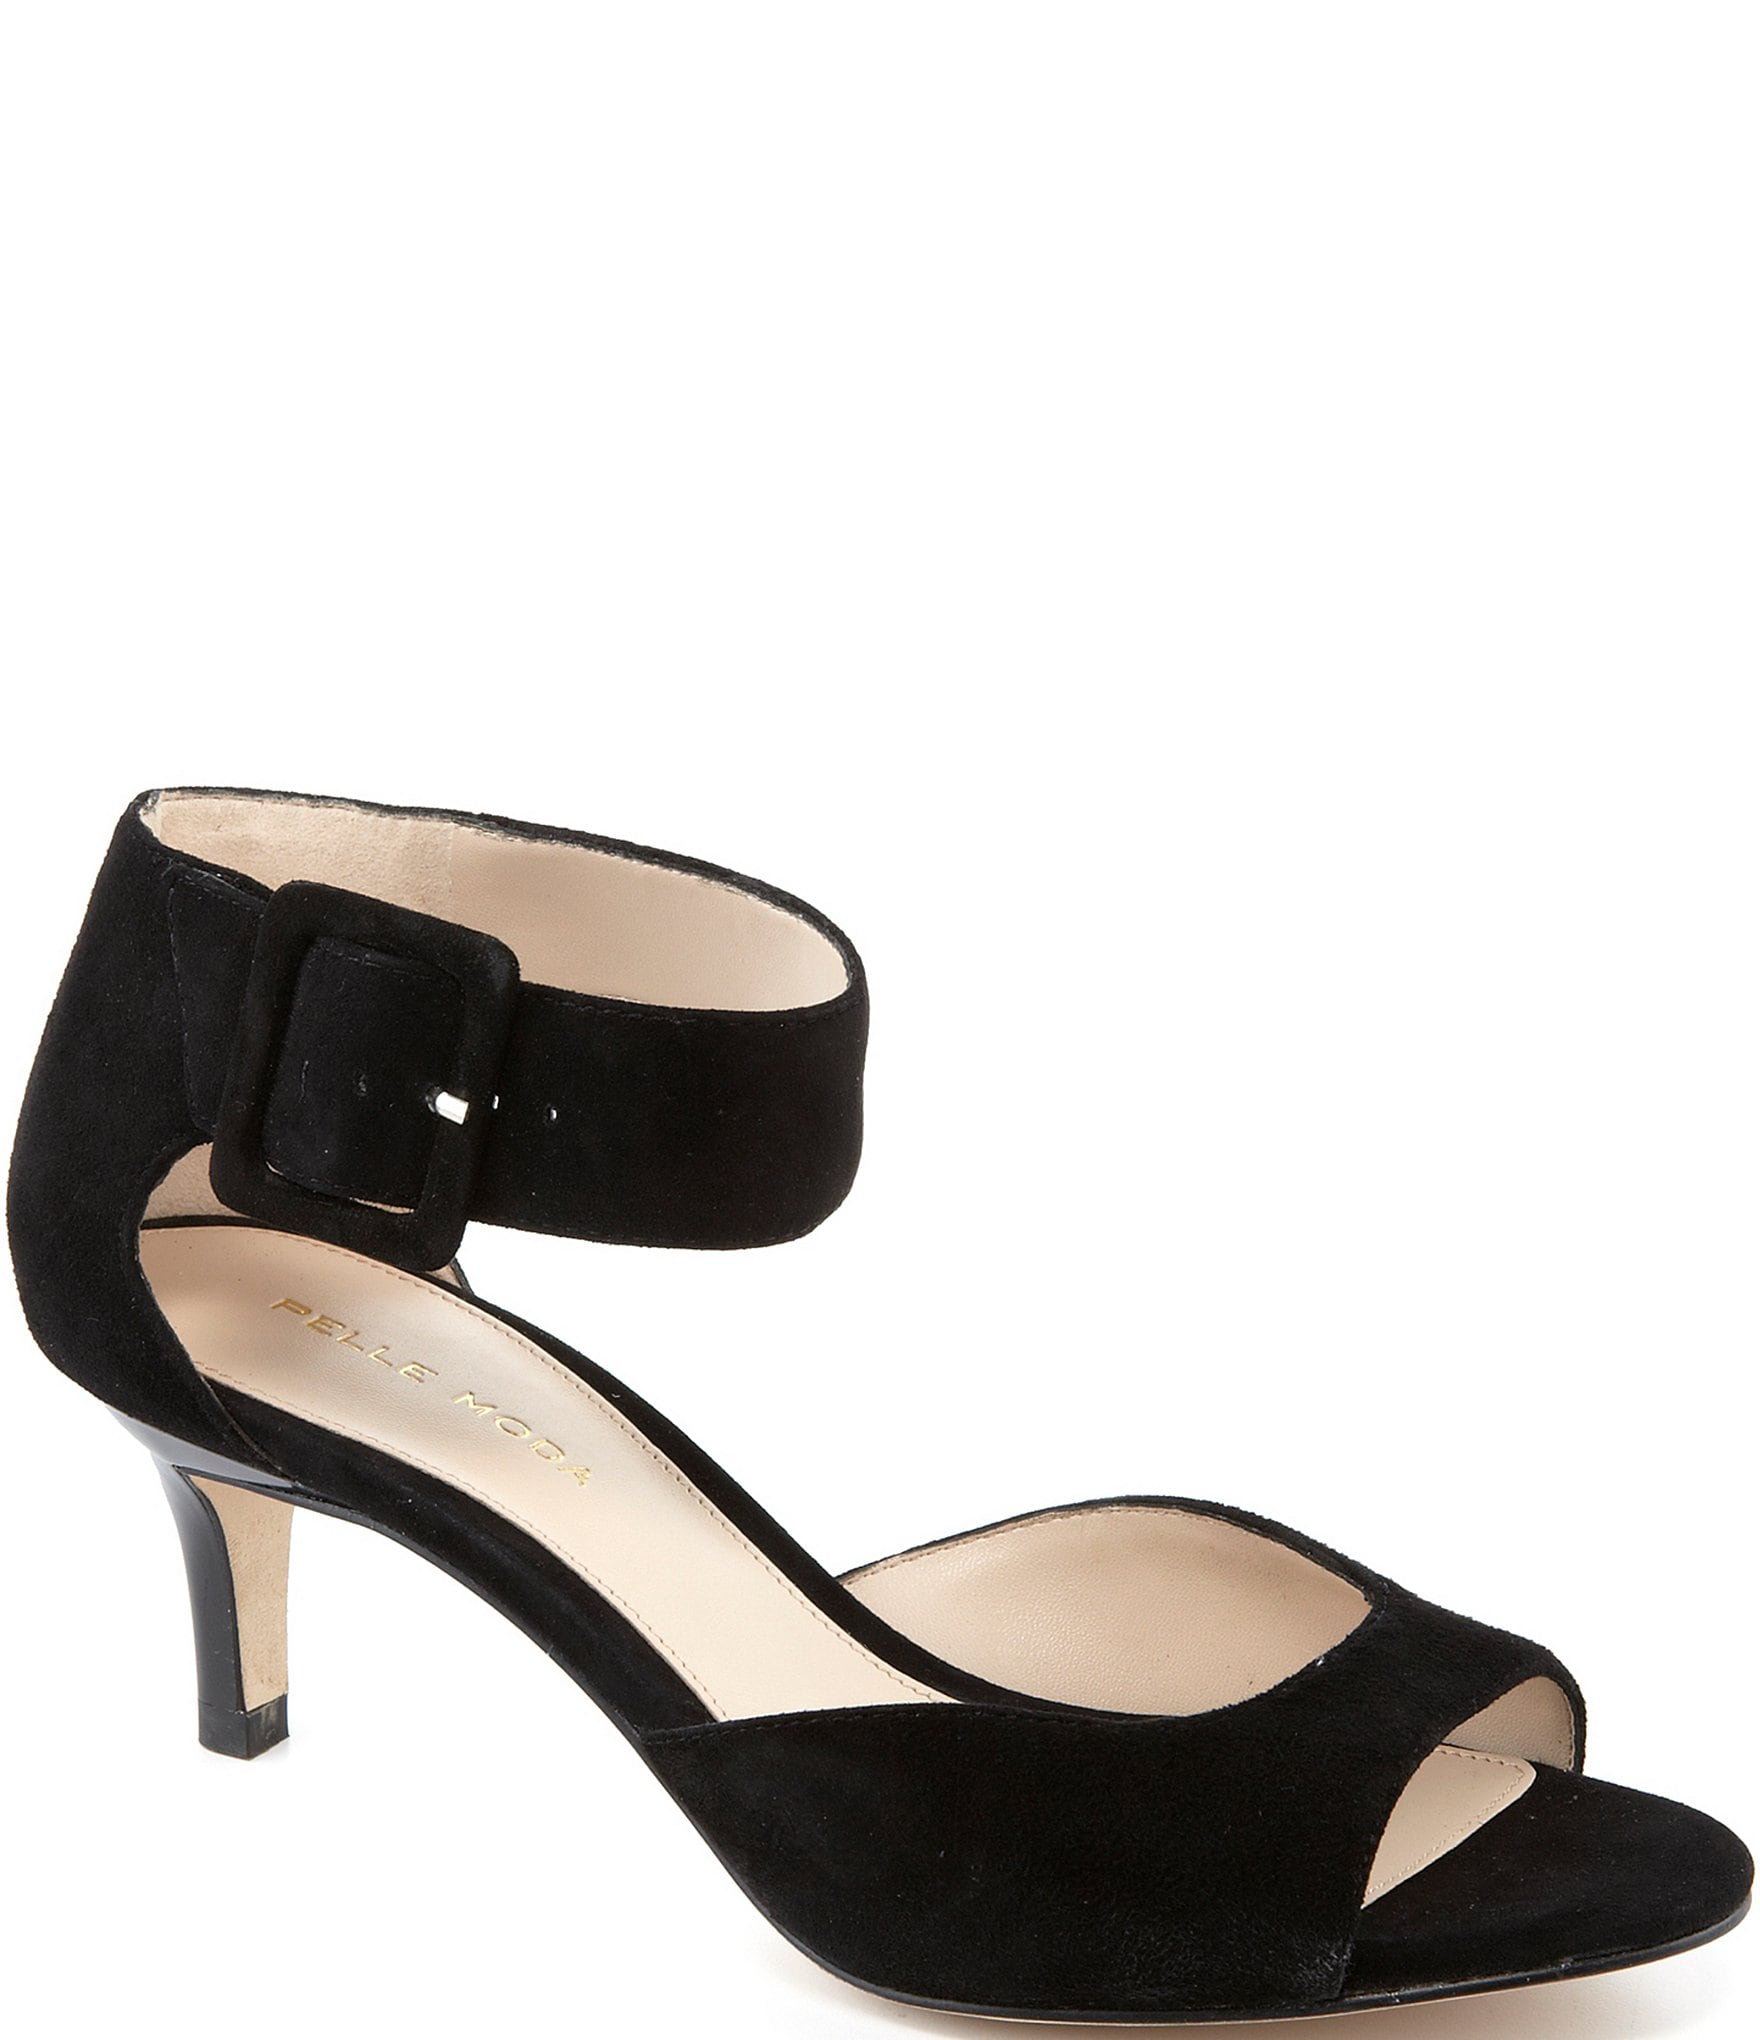 91507ec277a Kitten Heel Women s Sandals